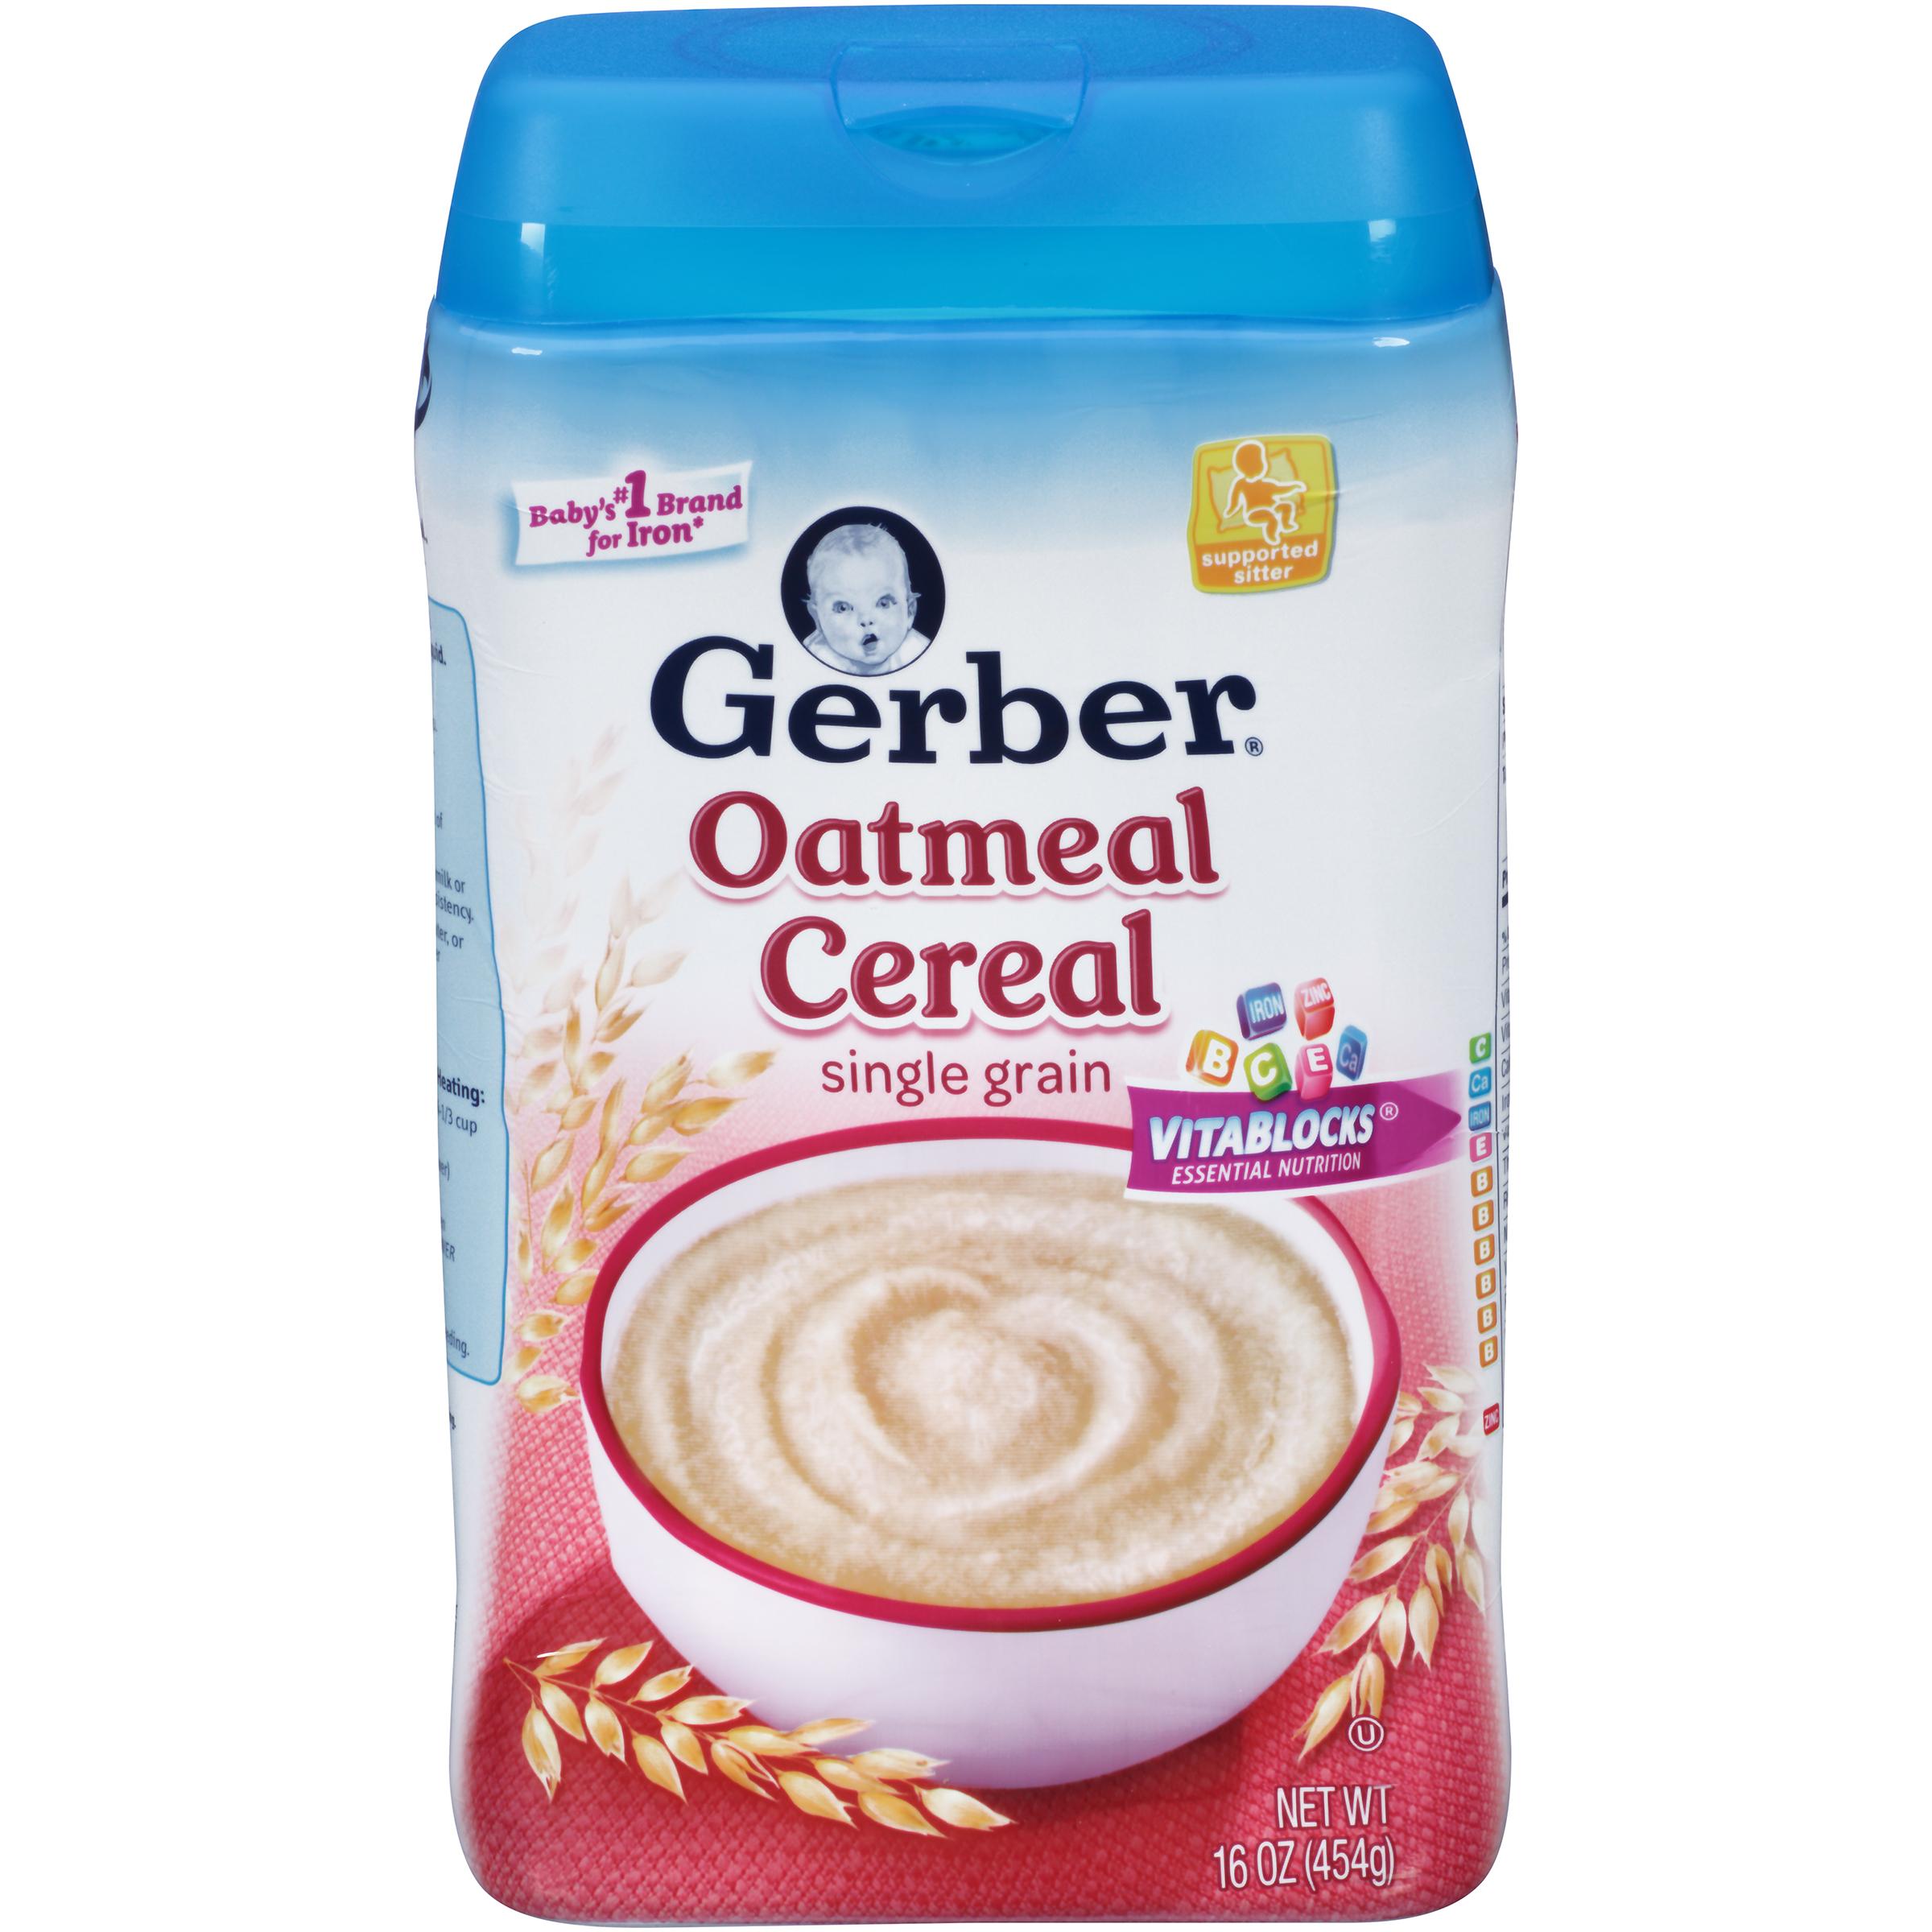 Gerber Gerber 1F Oatmeal Cereal Base Cereal WIC - Baby ...